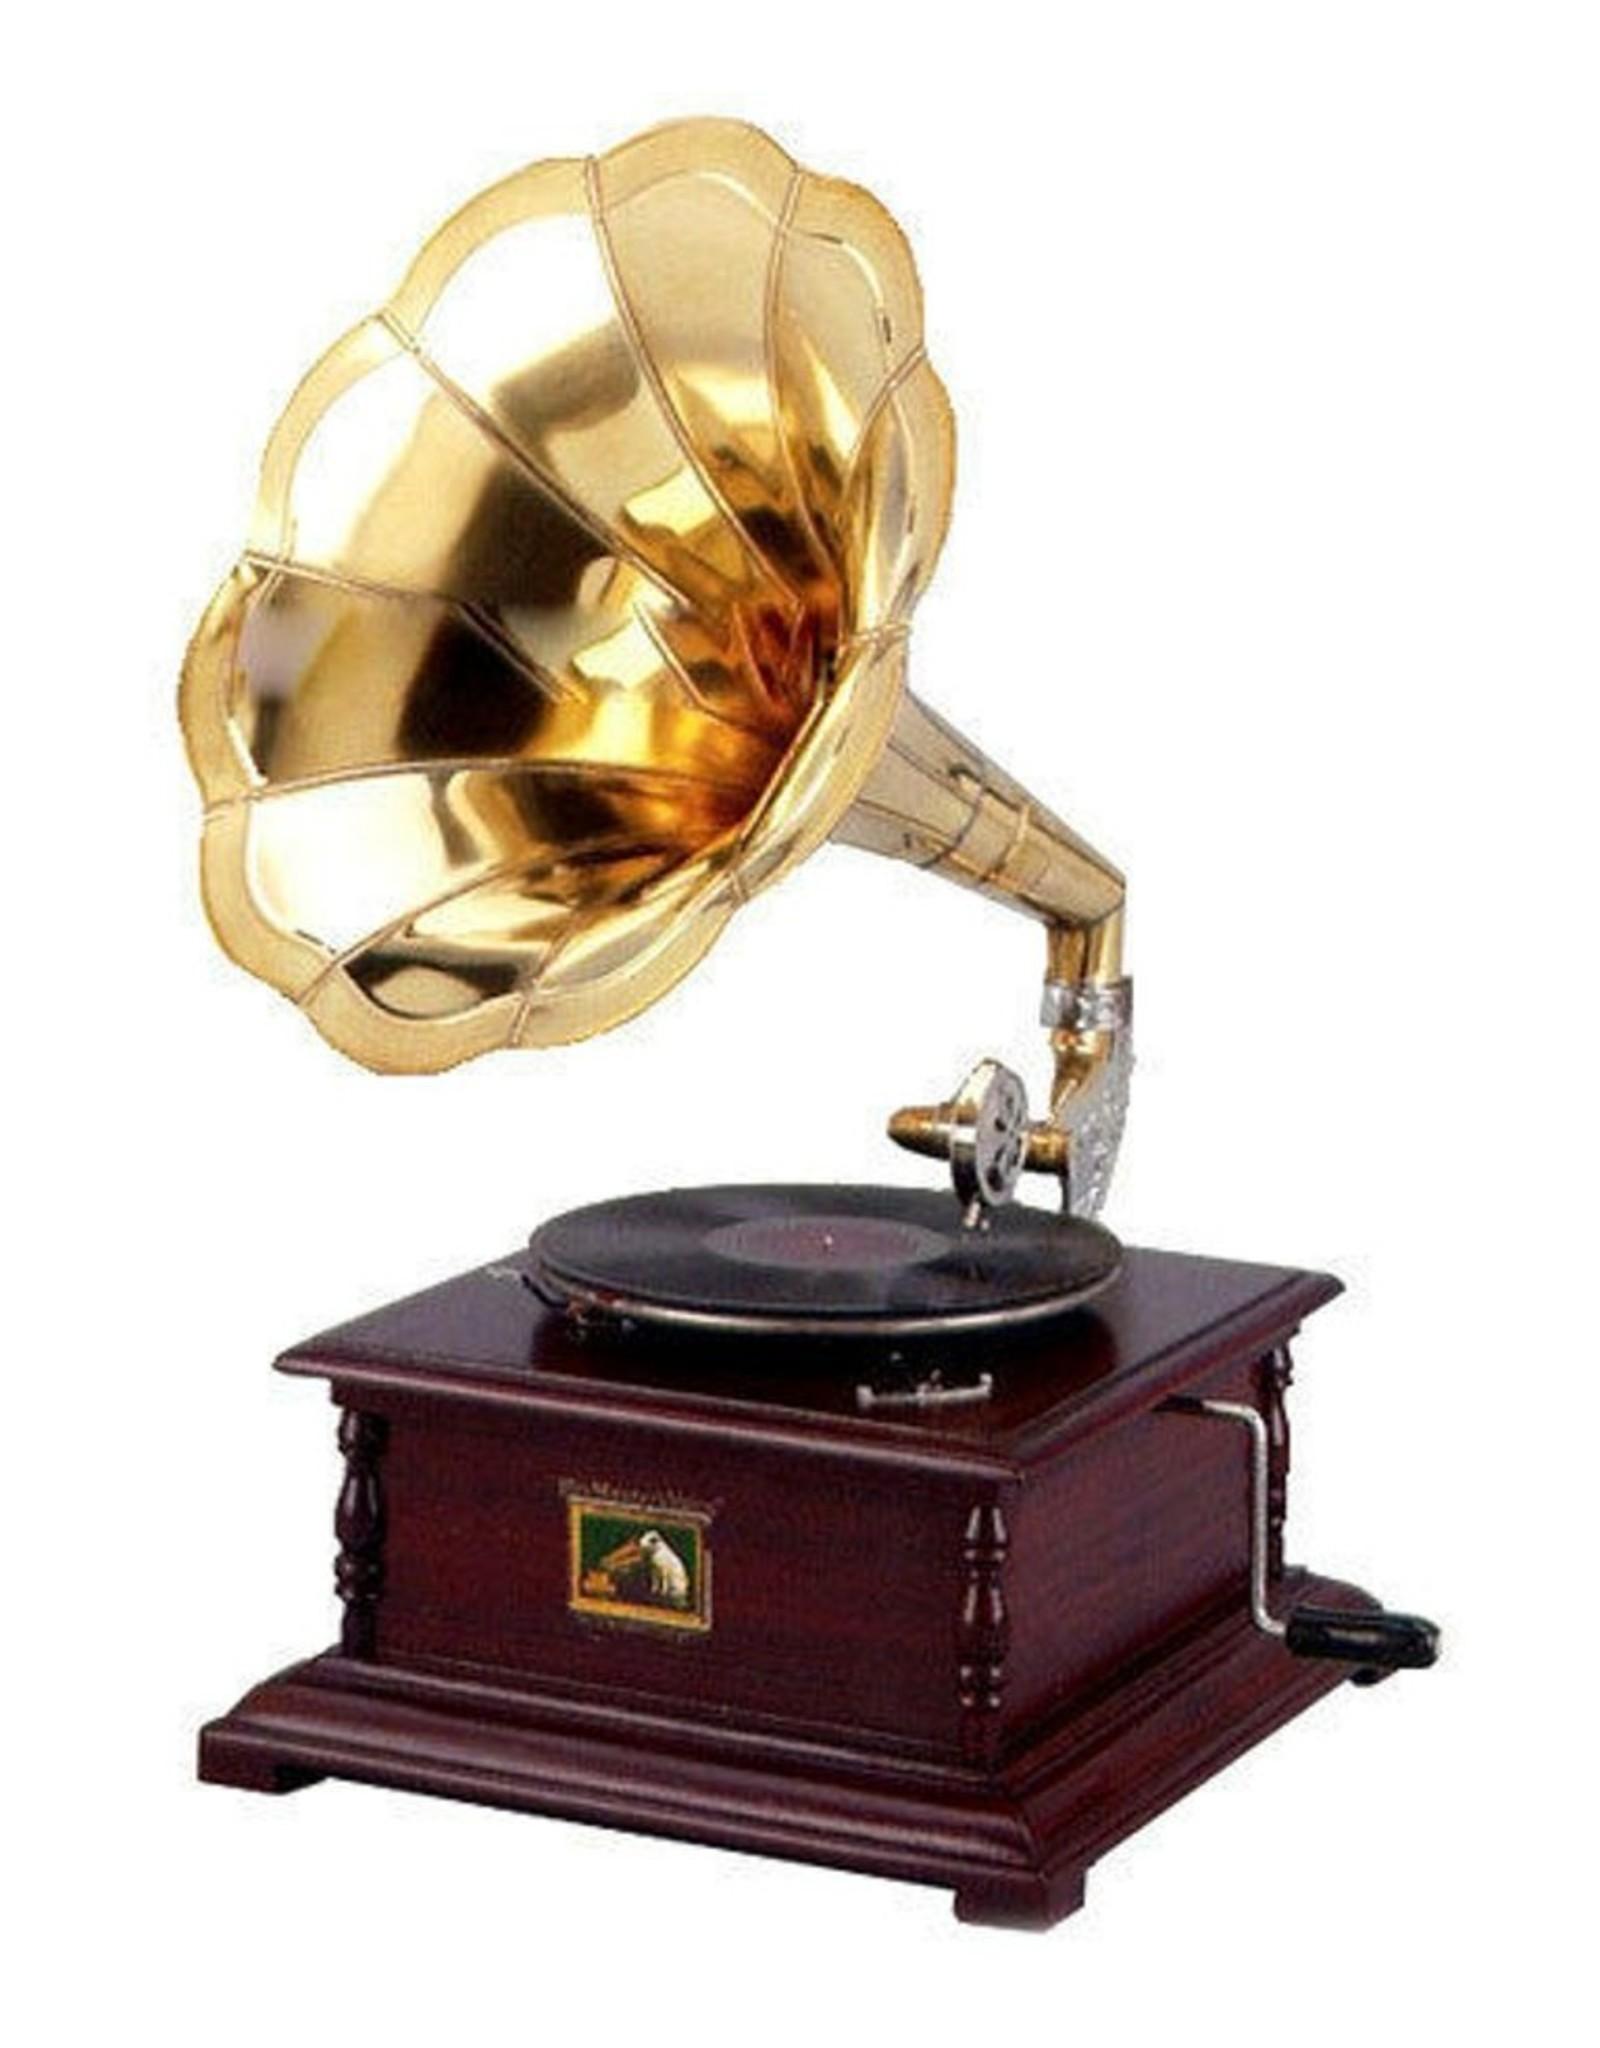 Grammofoon Miscellaneous - Grammofoon - Ouderwetse platenspeler met hoorn